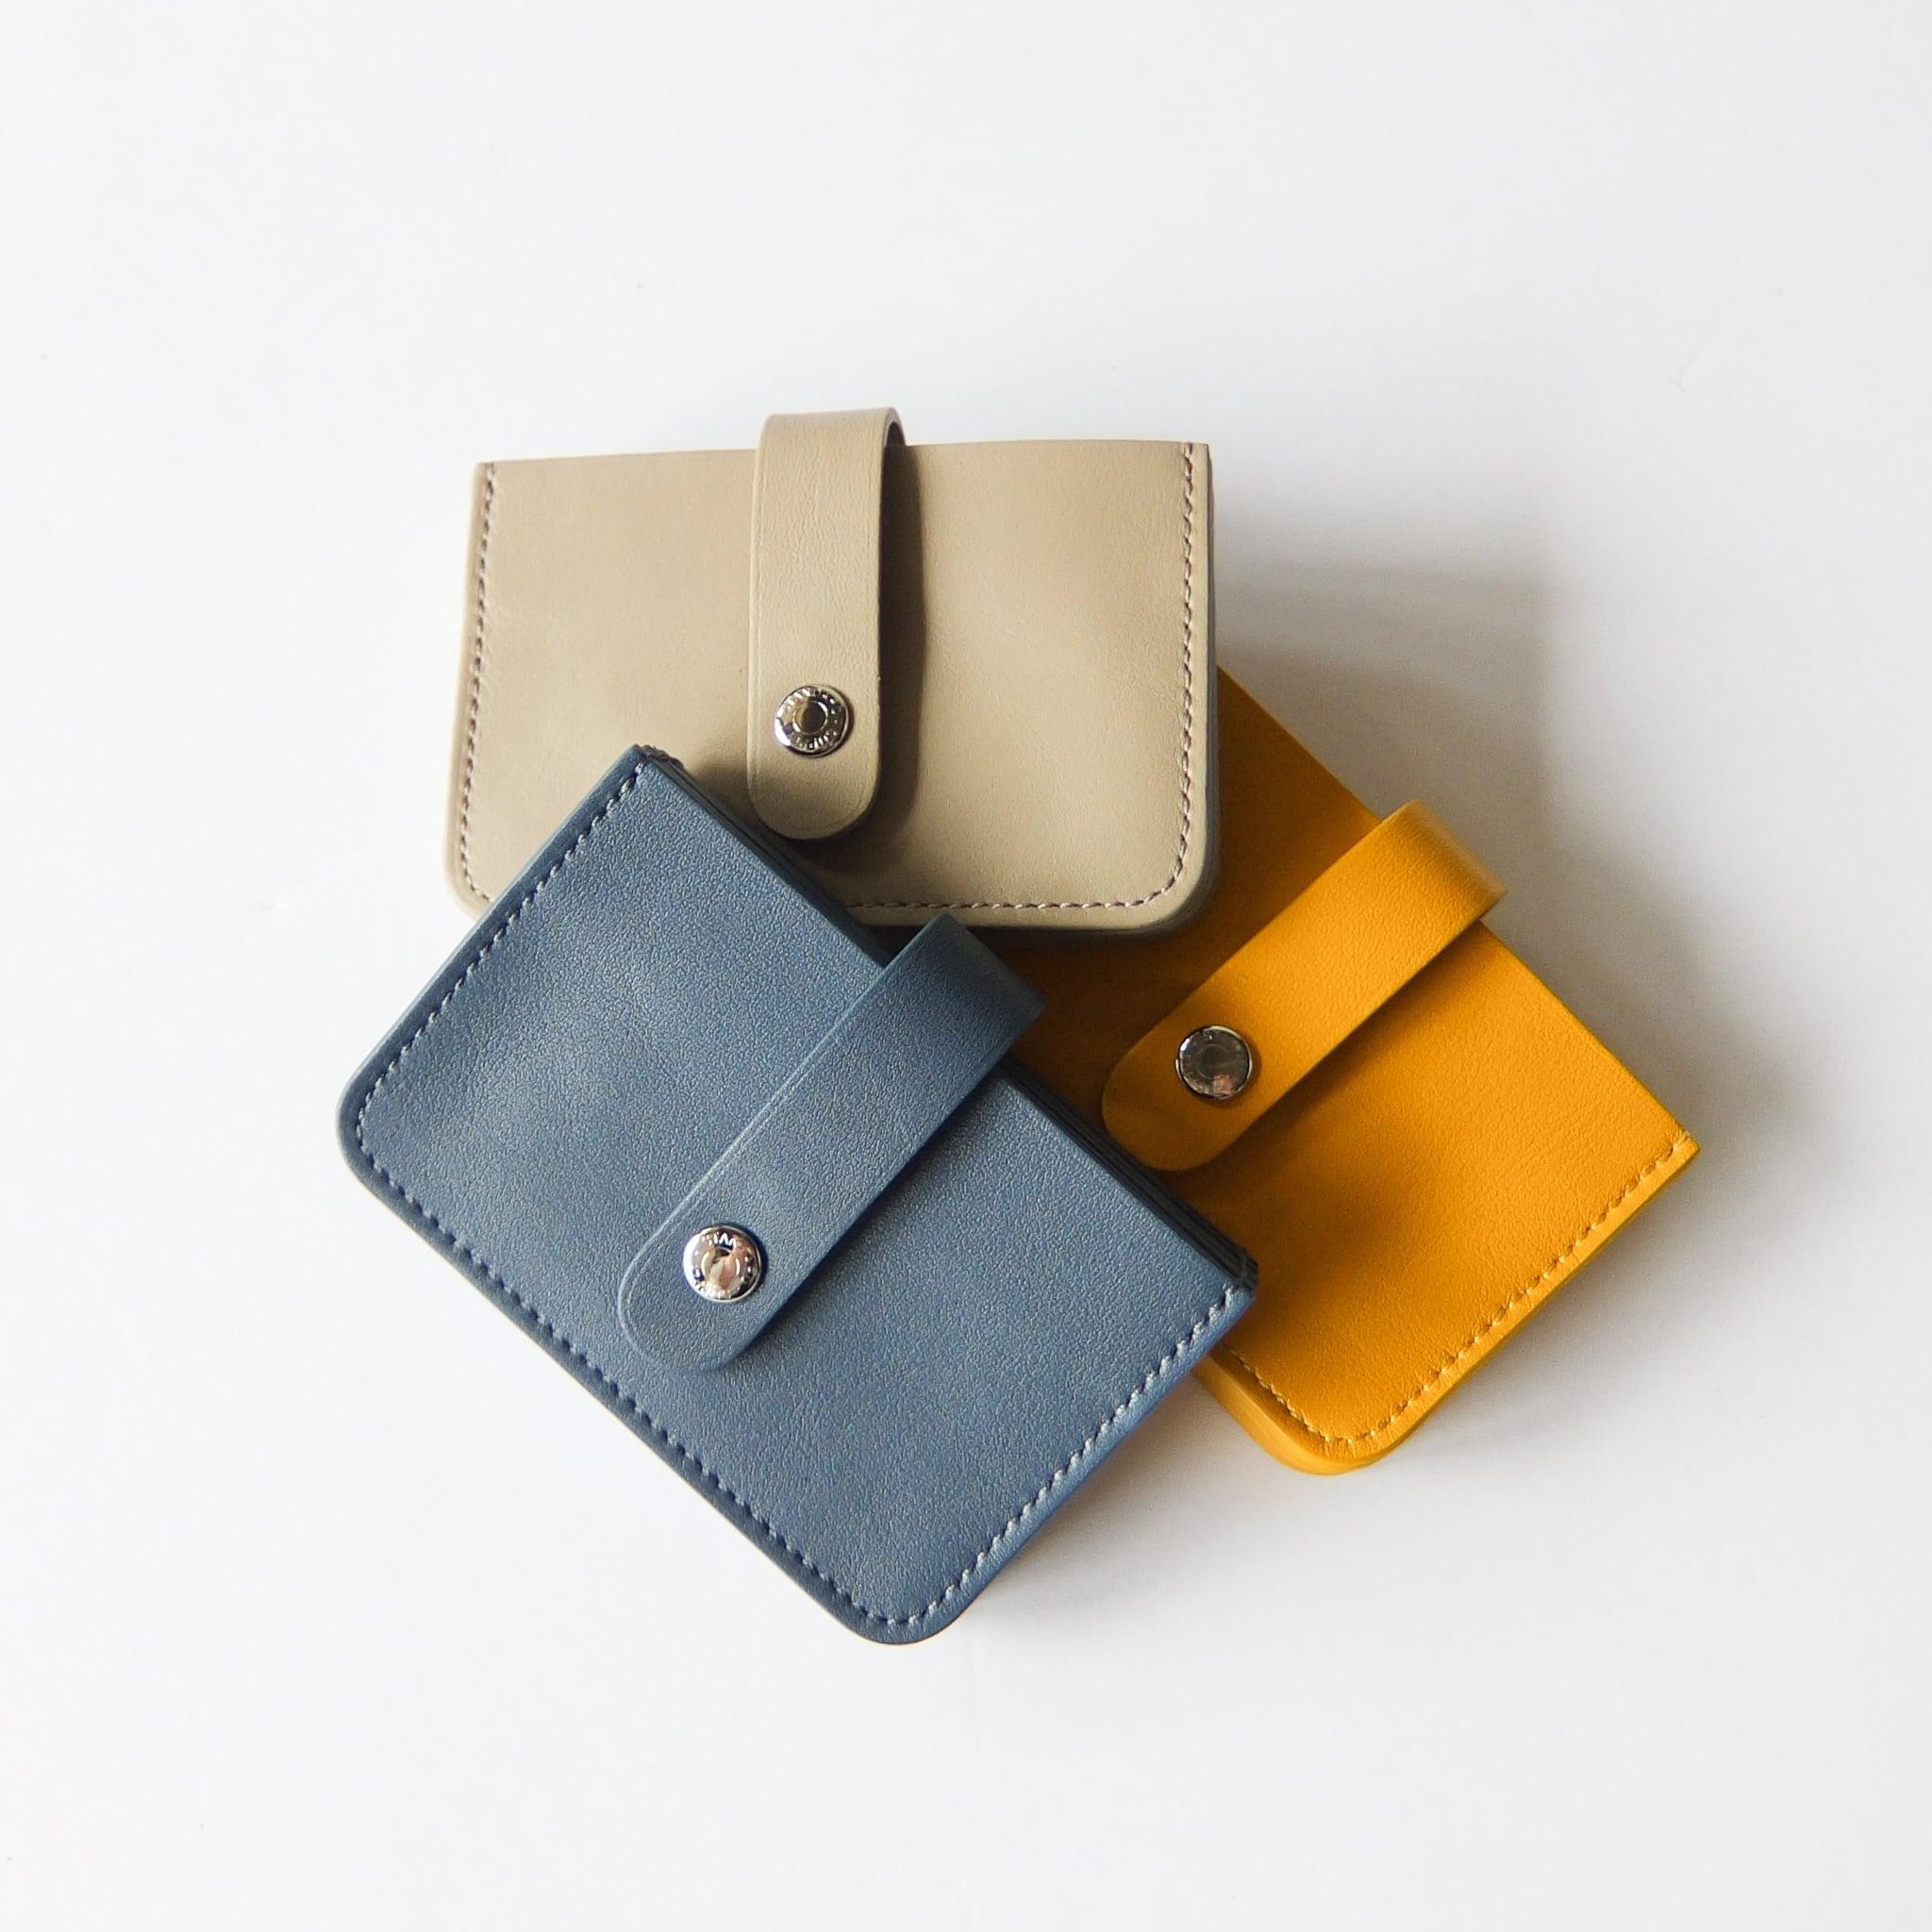 STANDARD SUPPLY - PAL  ACCORDION CARD CASE アコーディオンカードケース - Blue Grey / Yellow / Light Beige